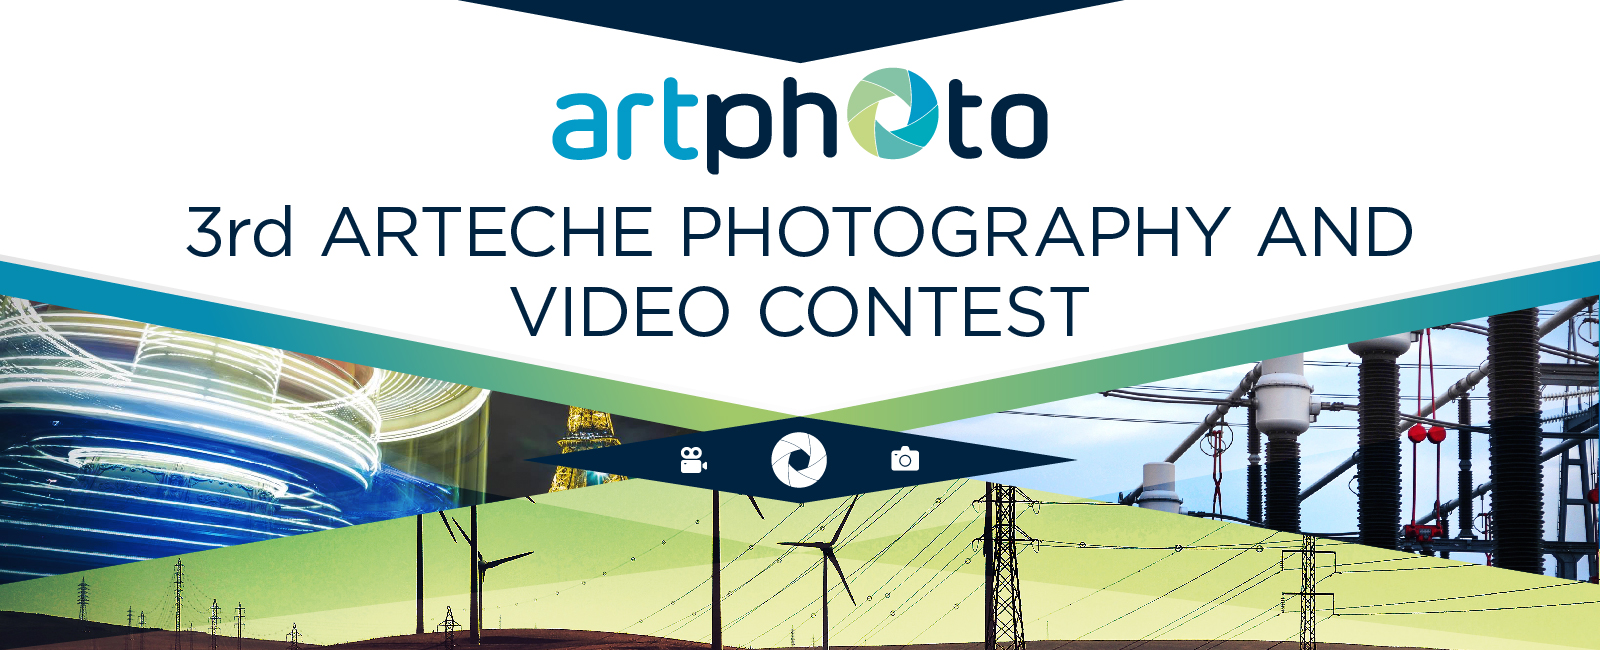 artPhoto - logo